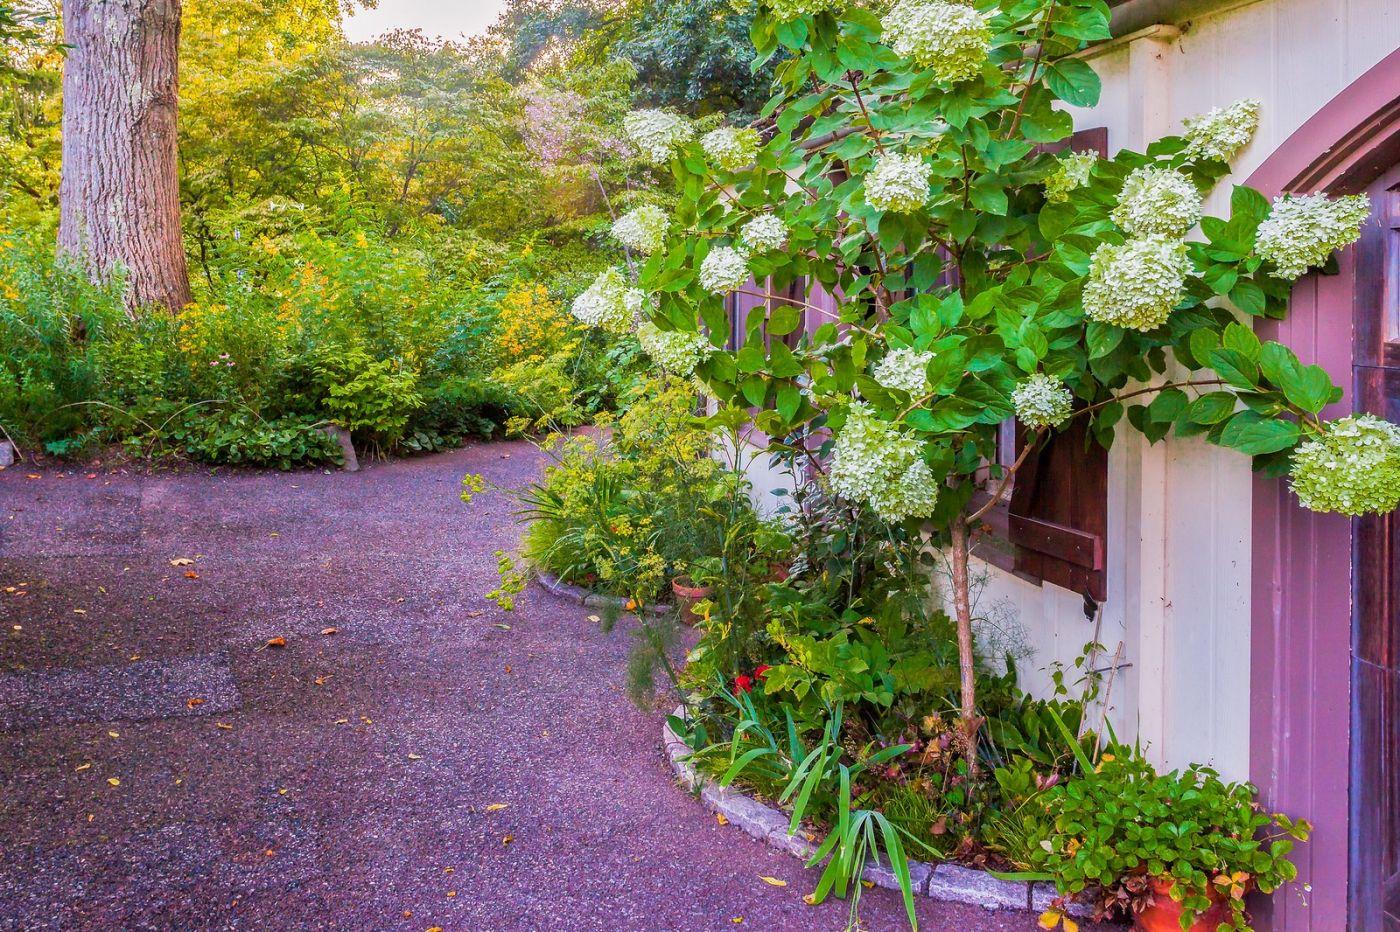 Chanticleer花园,春风得意_图1-14